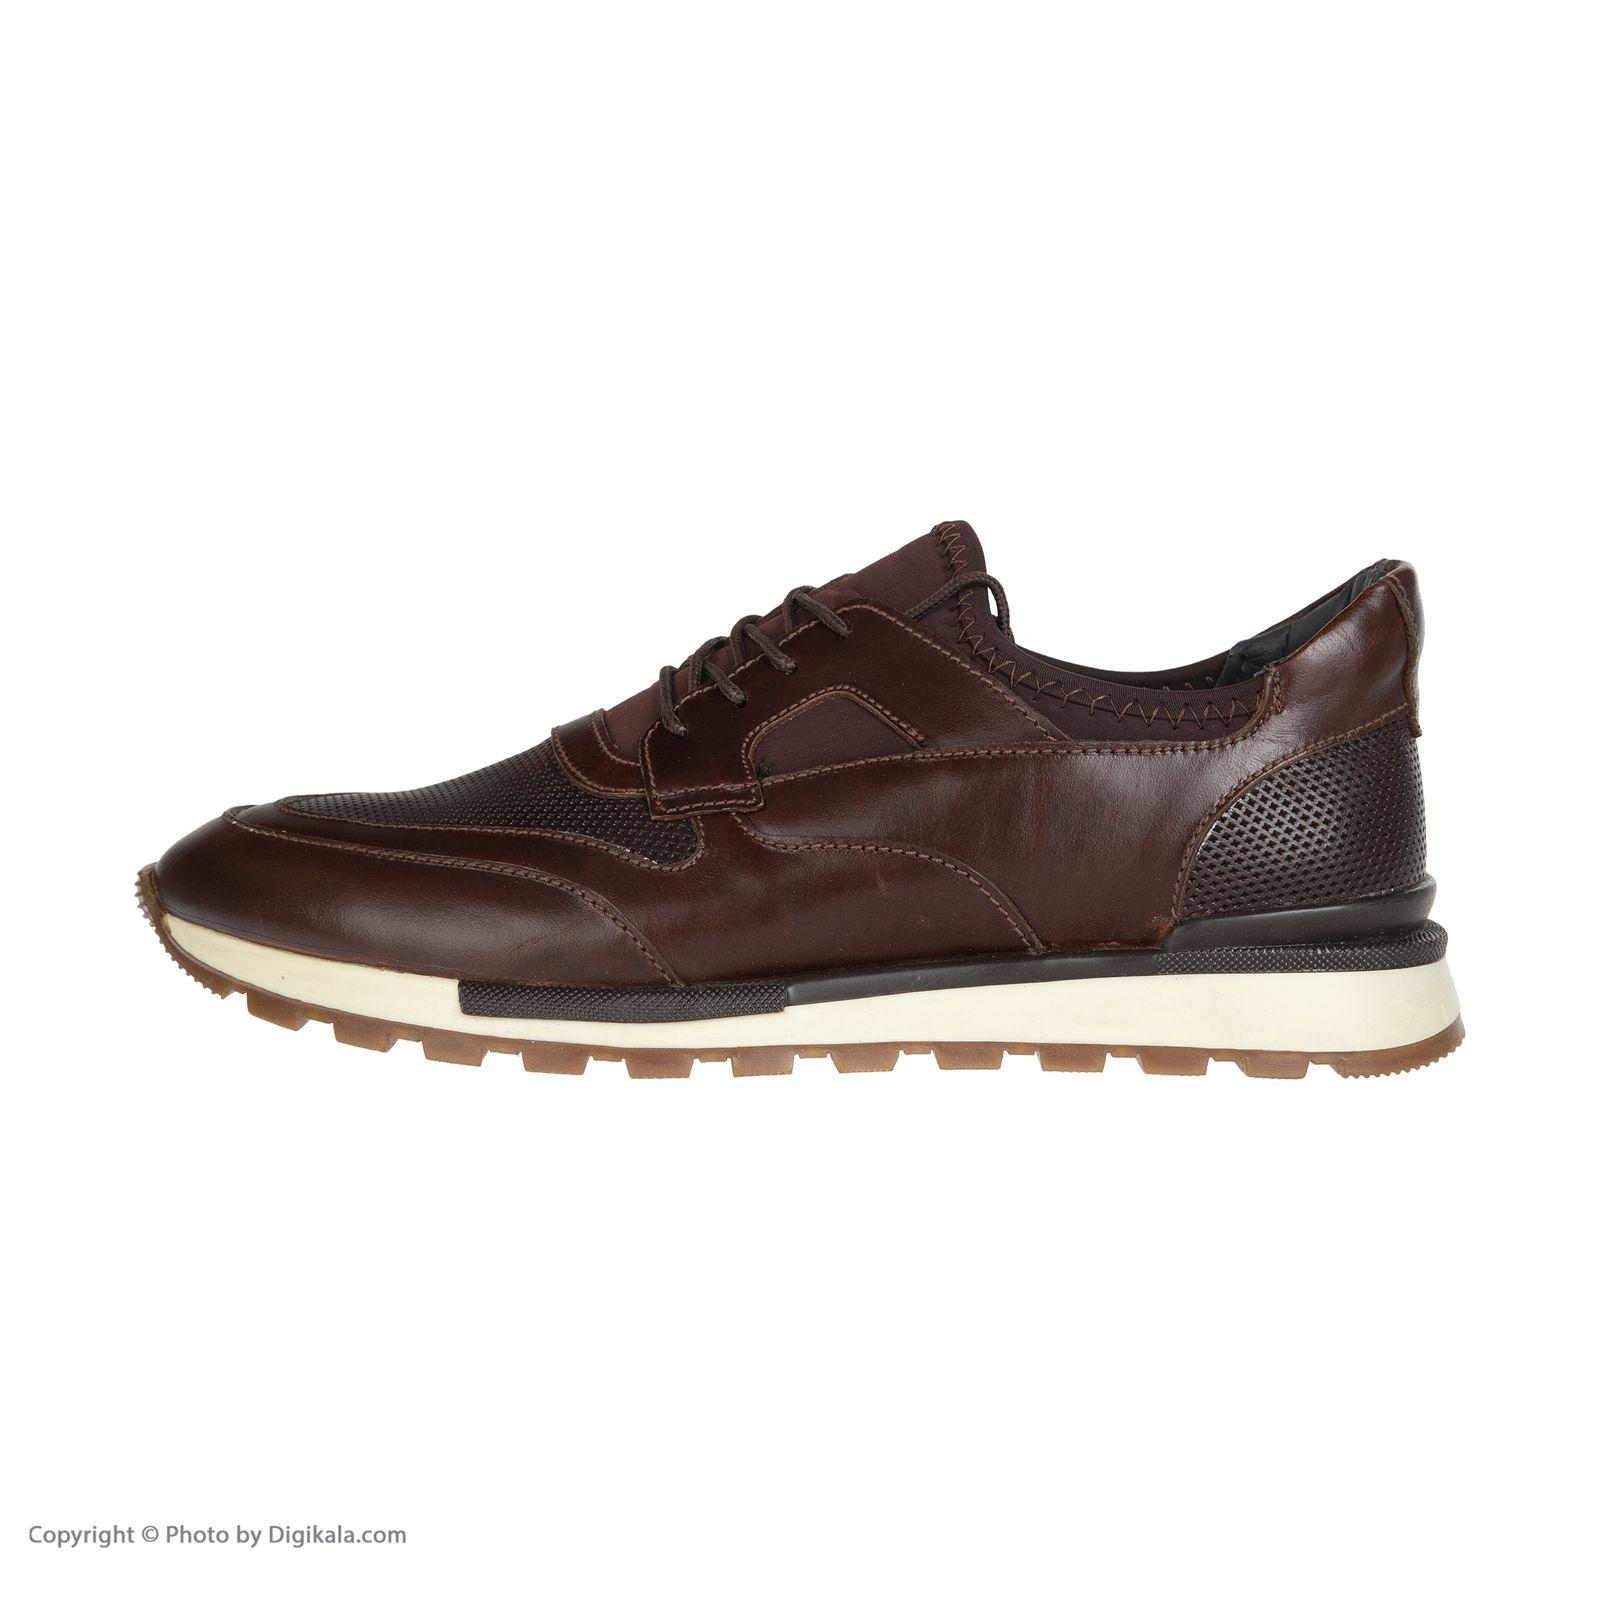 کفش روزمره مردانه دلفارد مدل 8374A503104 -  - 3